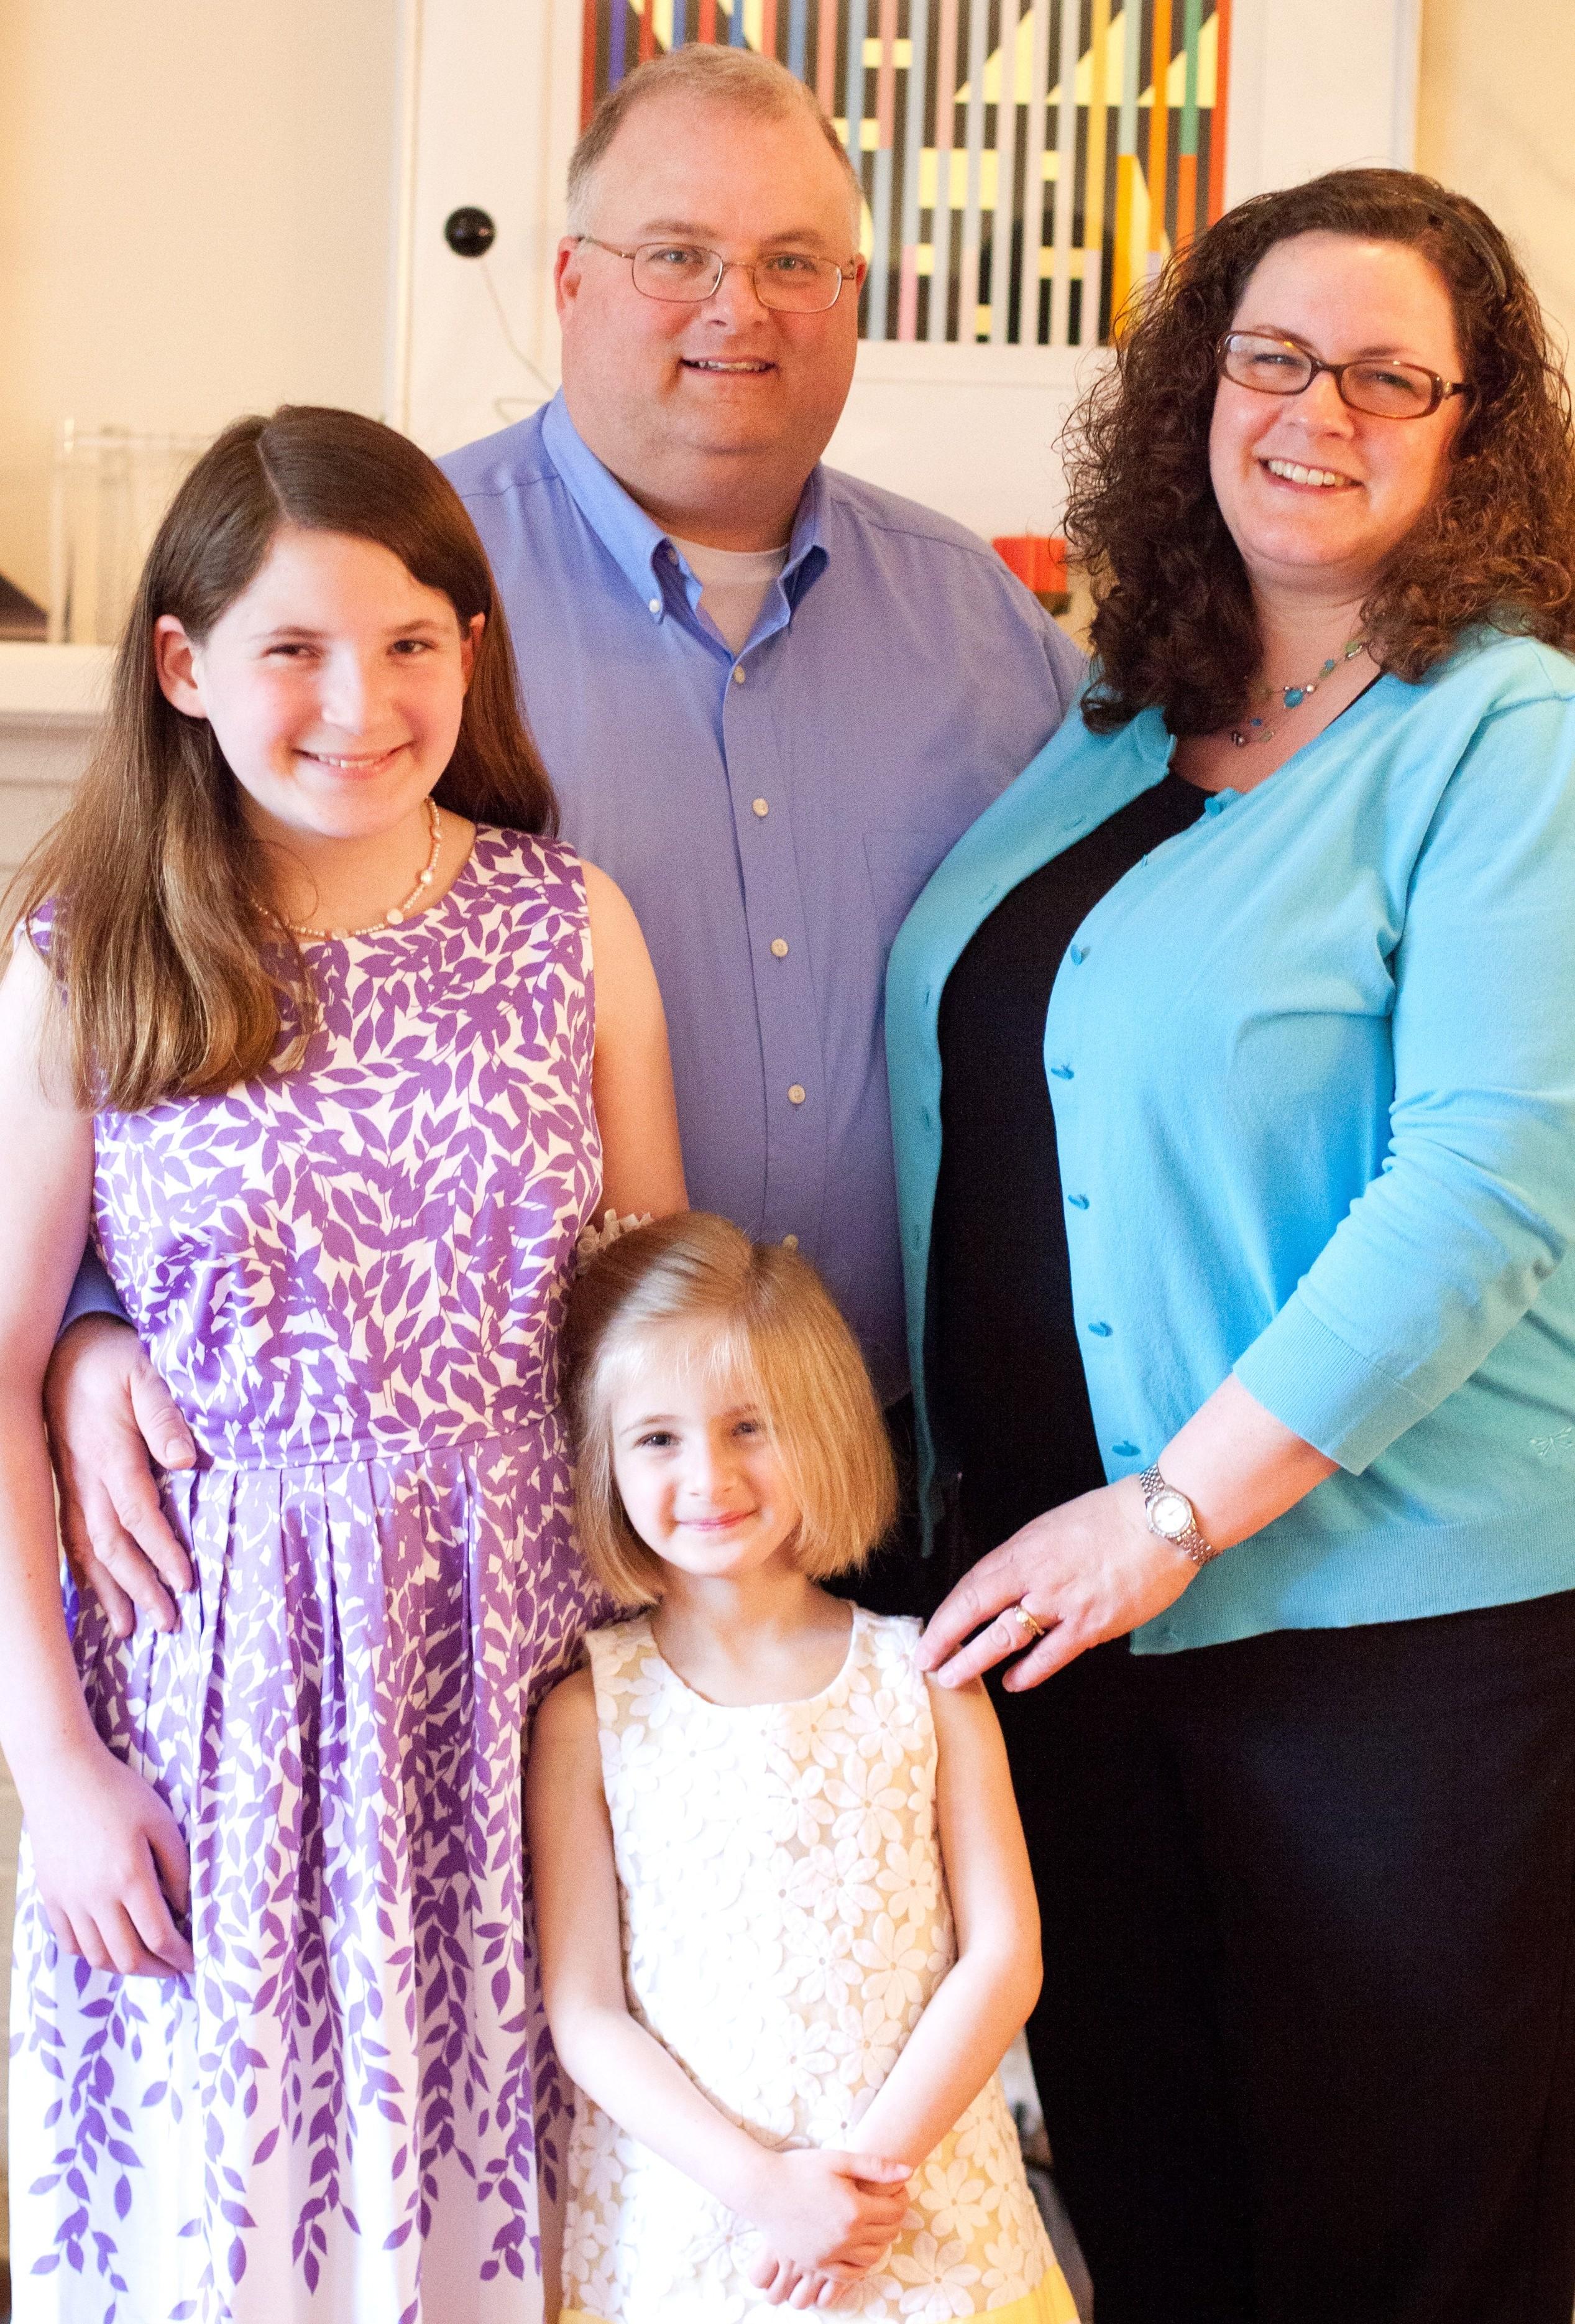 family_photo_2015.jpg